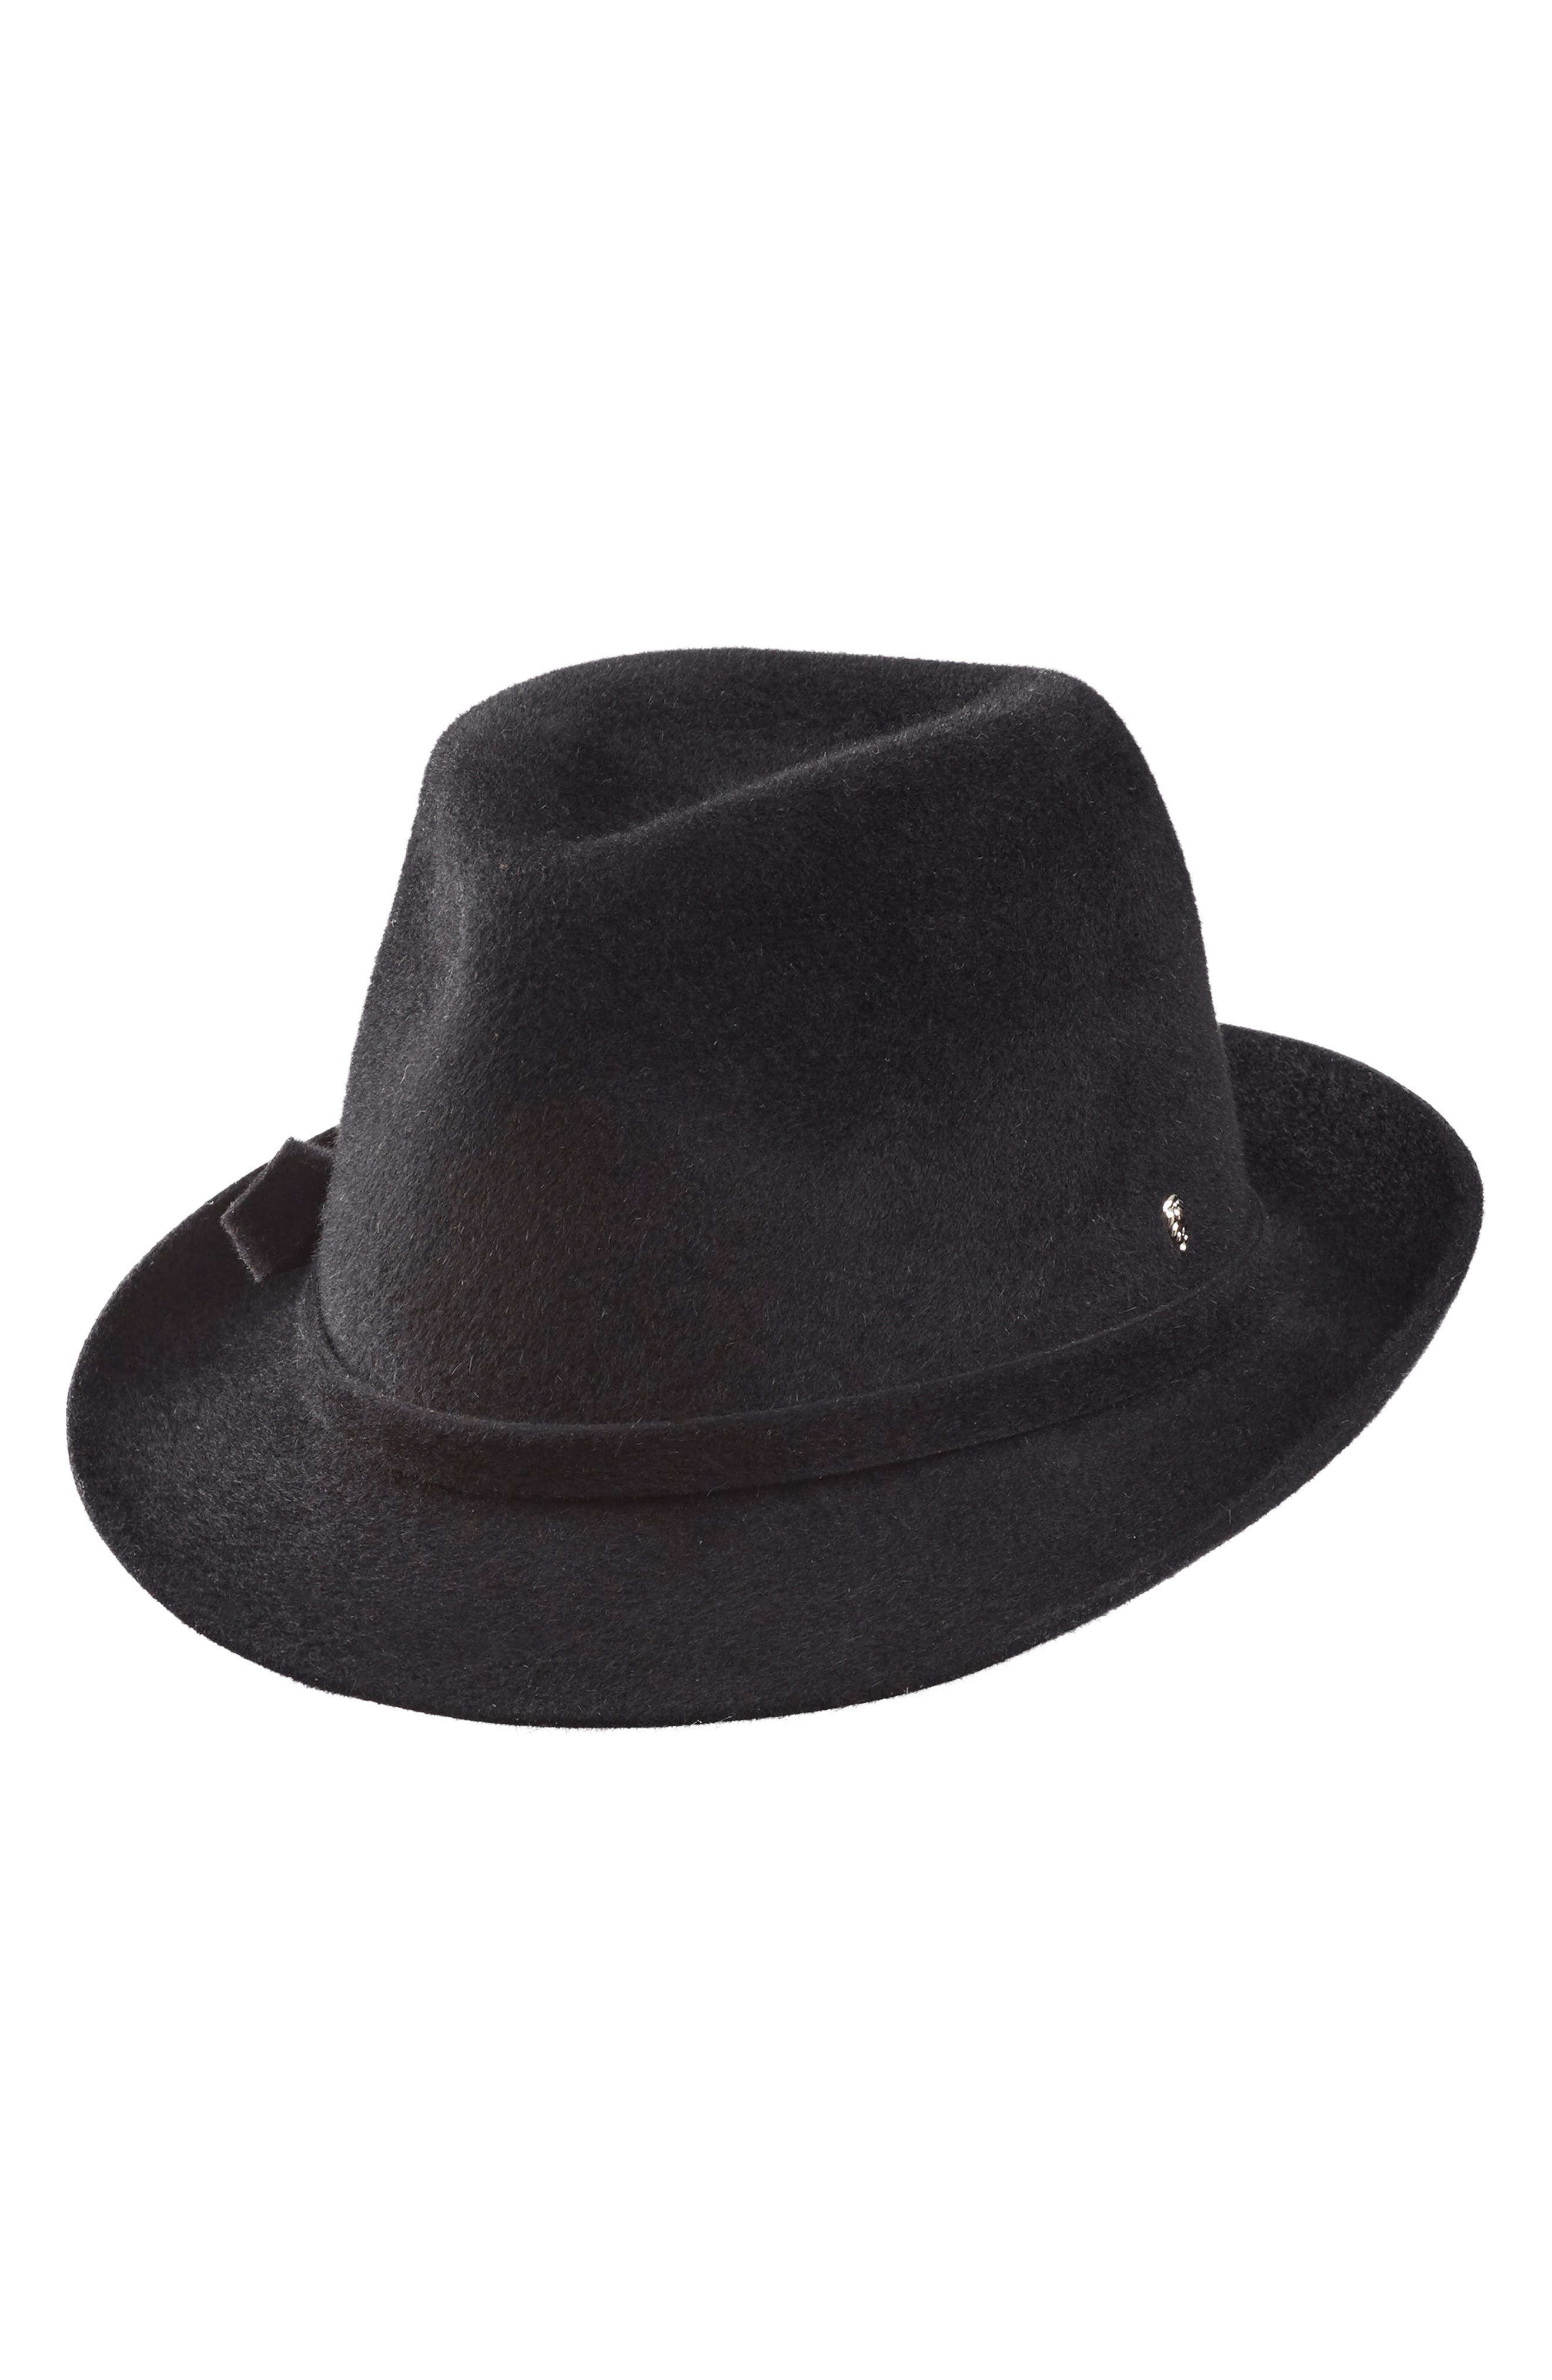 c2ab9e612 women s felt hats